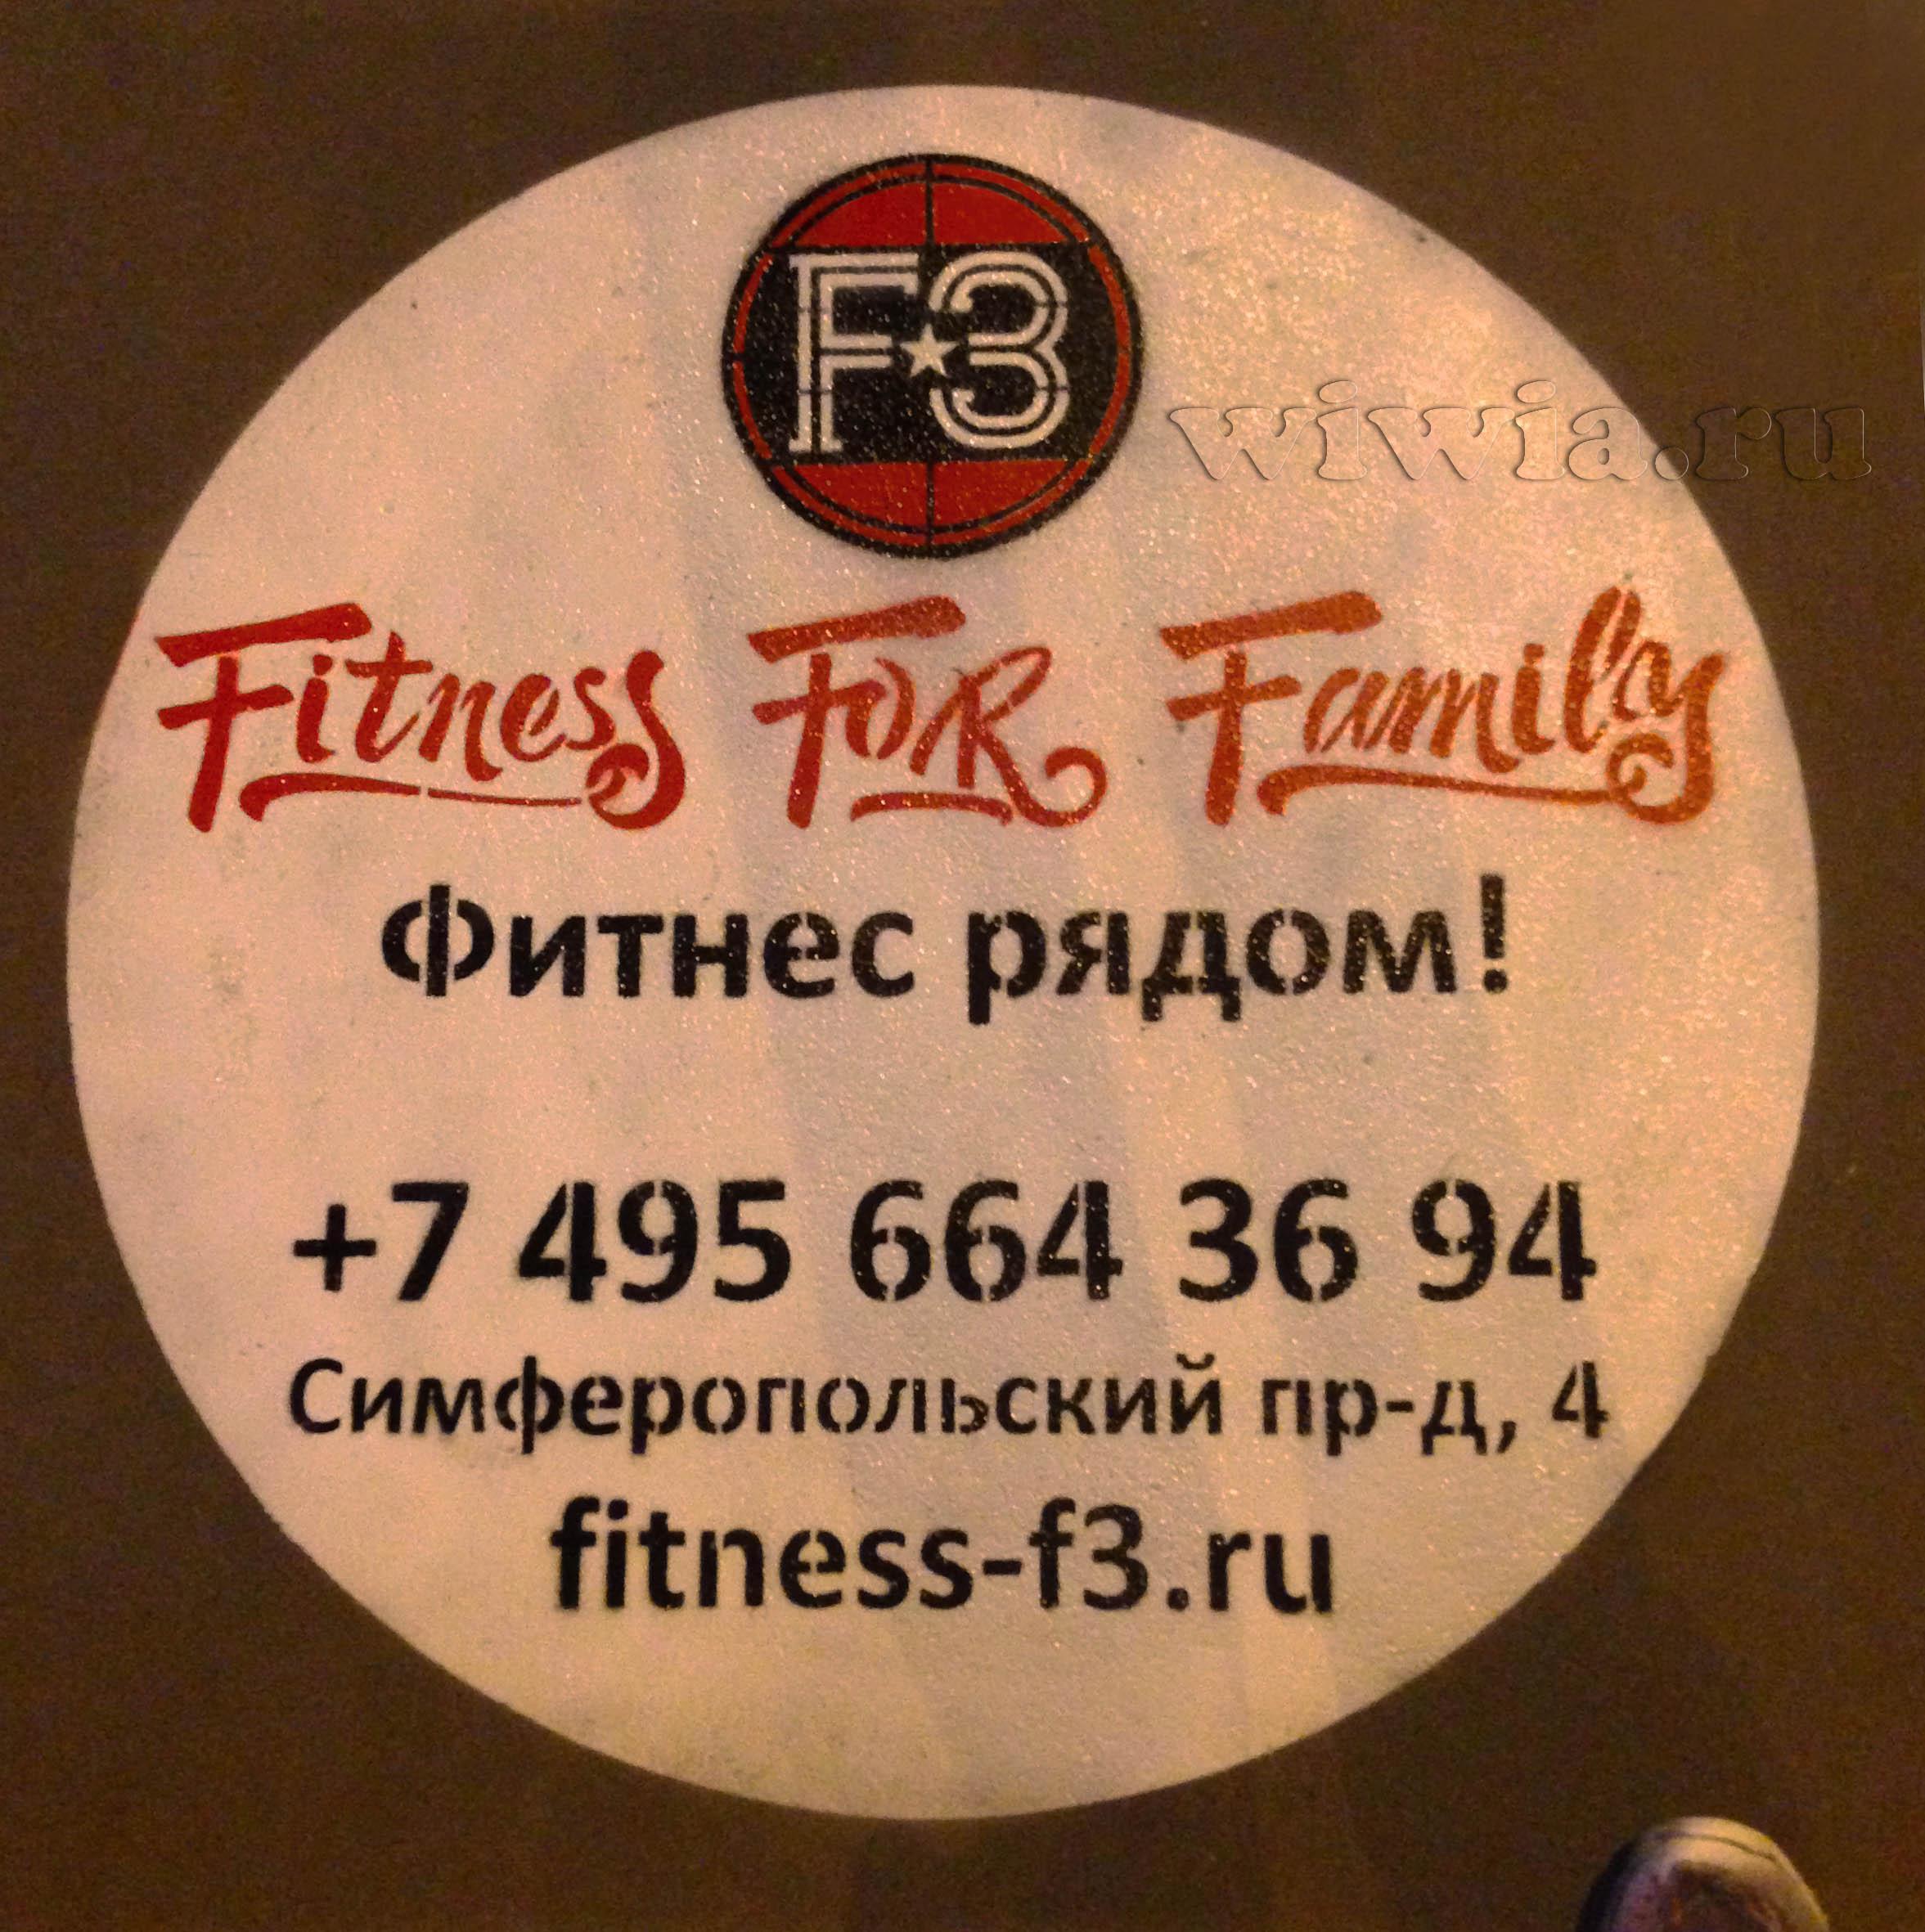 Реклама на асфальте. Фитнес рядом!